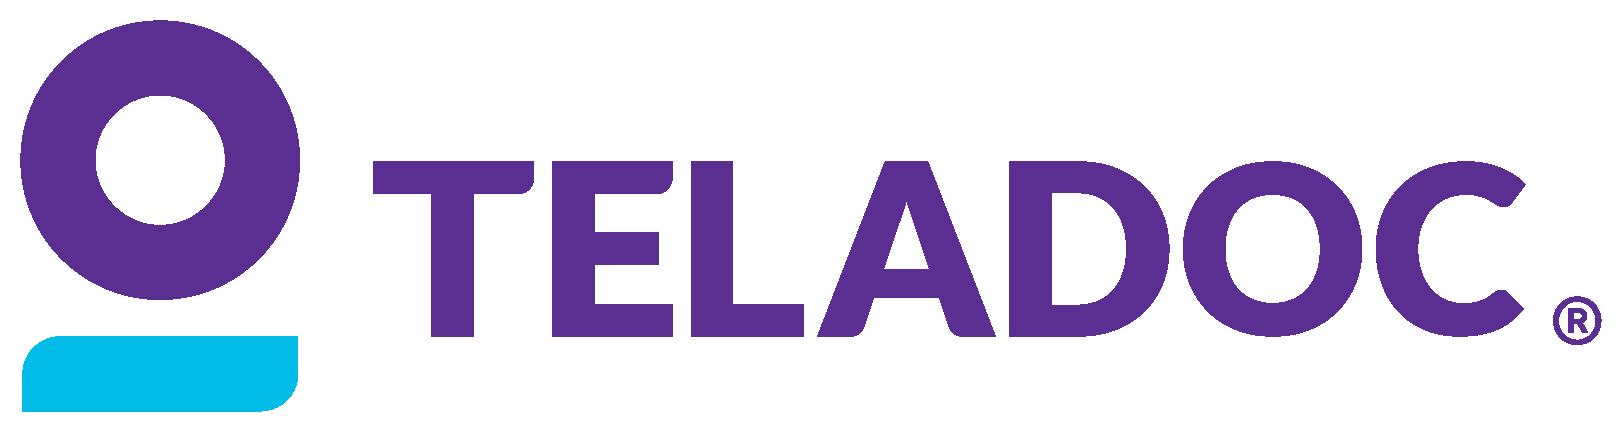 Teladoc, Inc. Program Terms